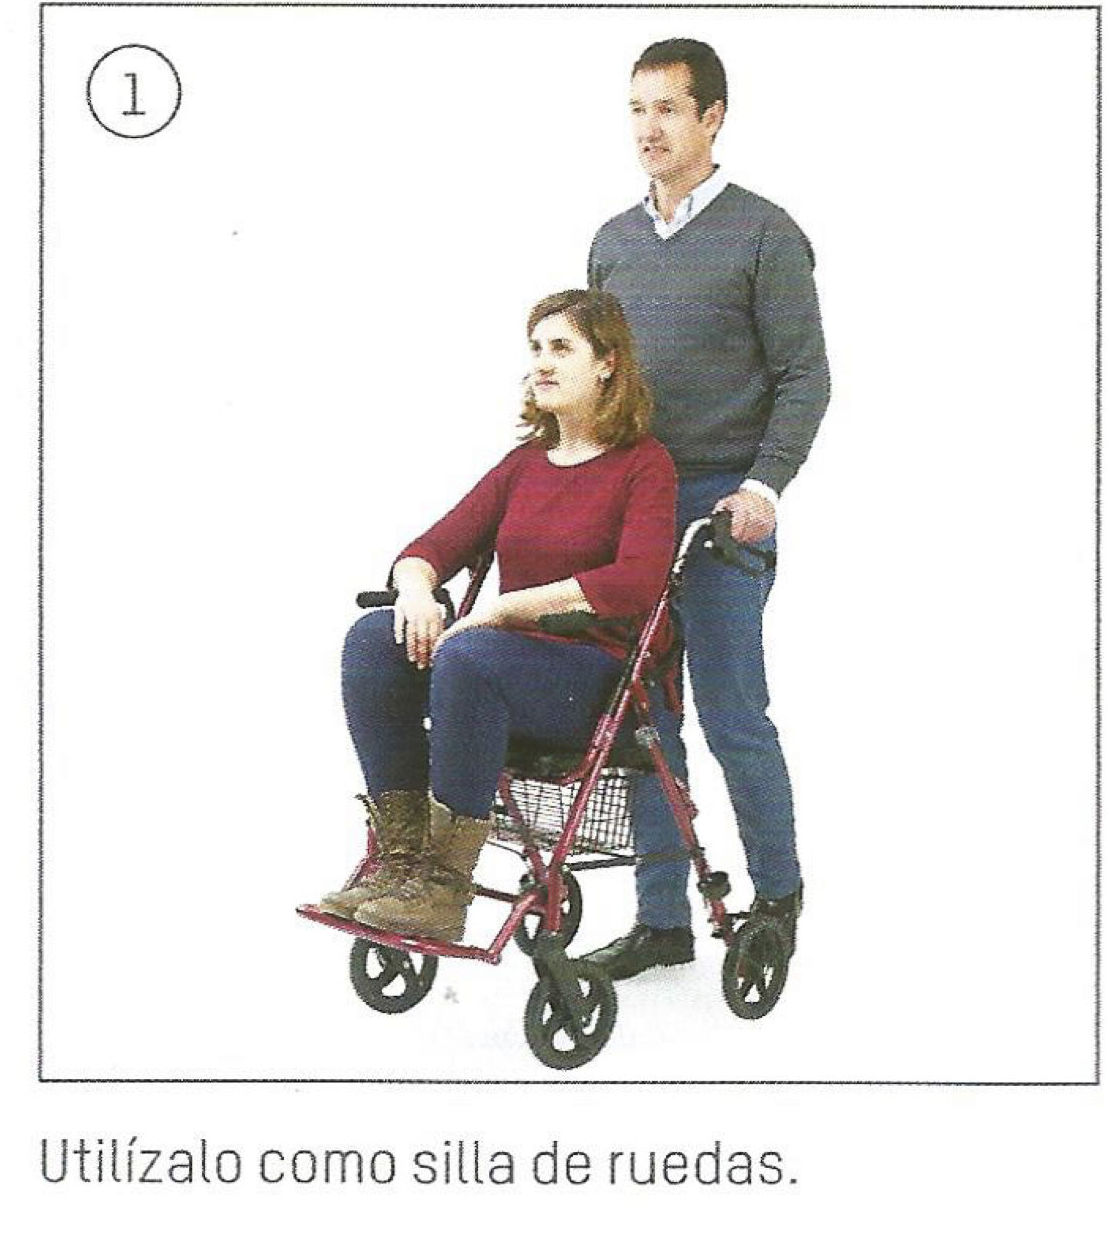 Andador classic duo: TIENDA ONLINE de Ortopedia La Fama